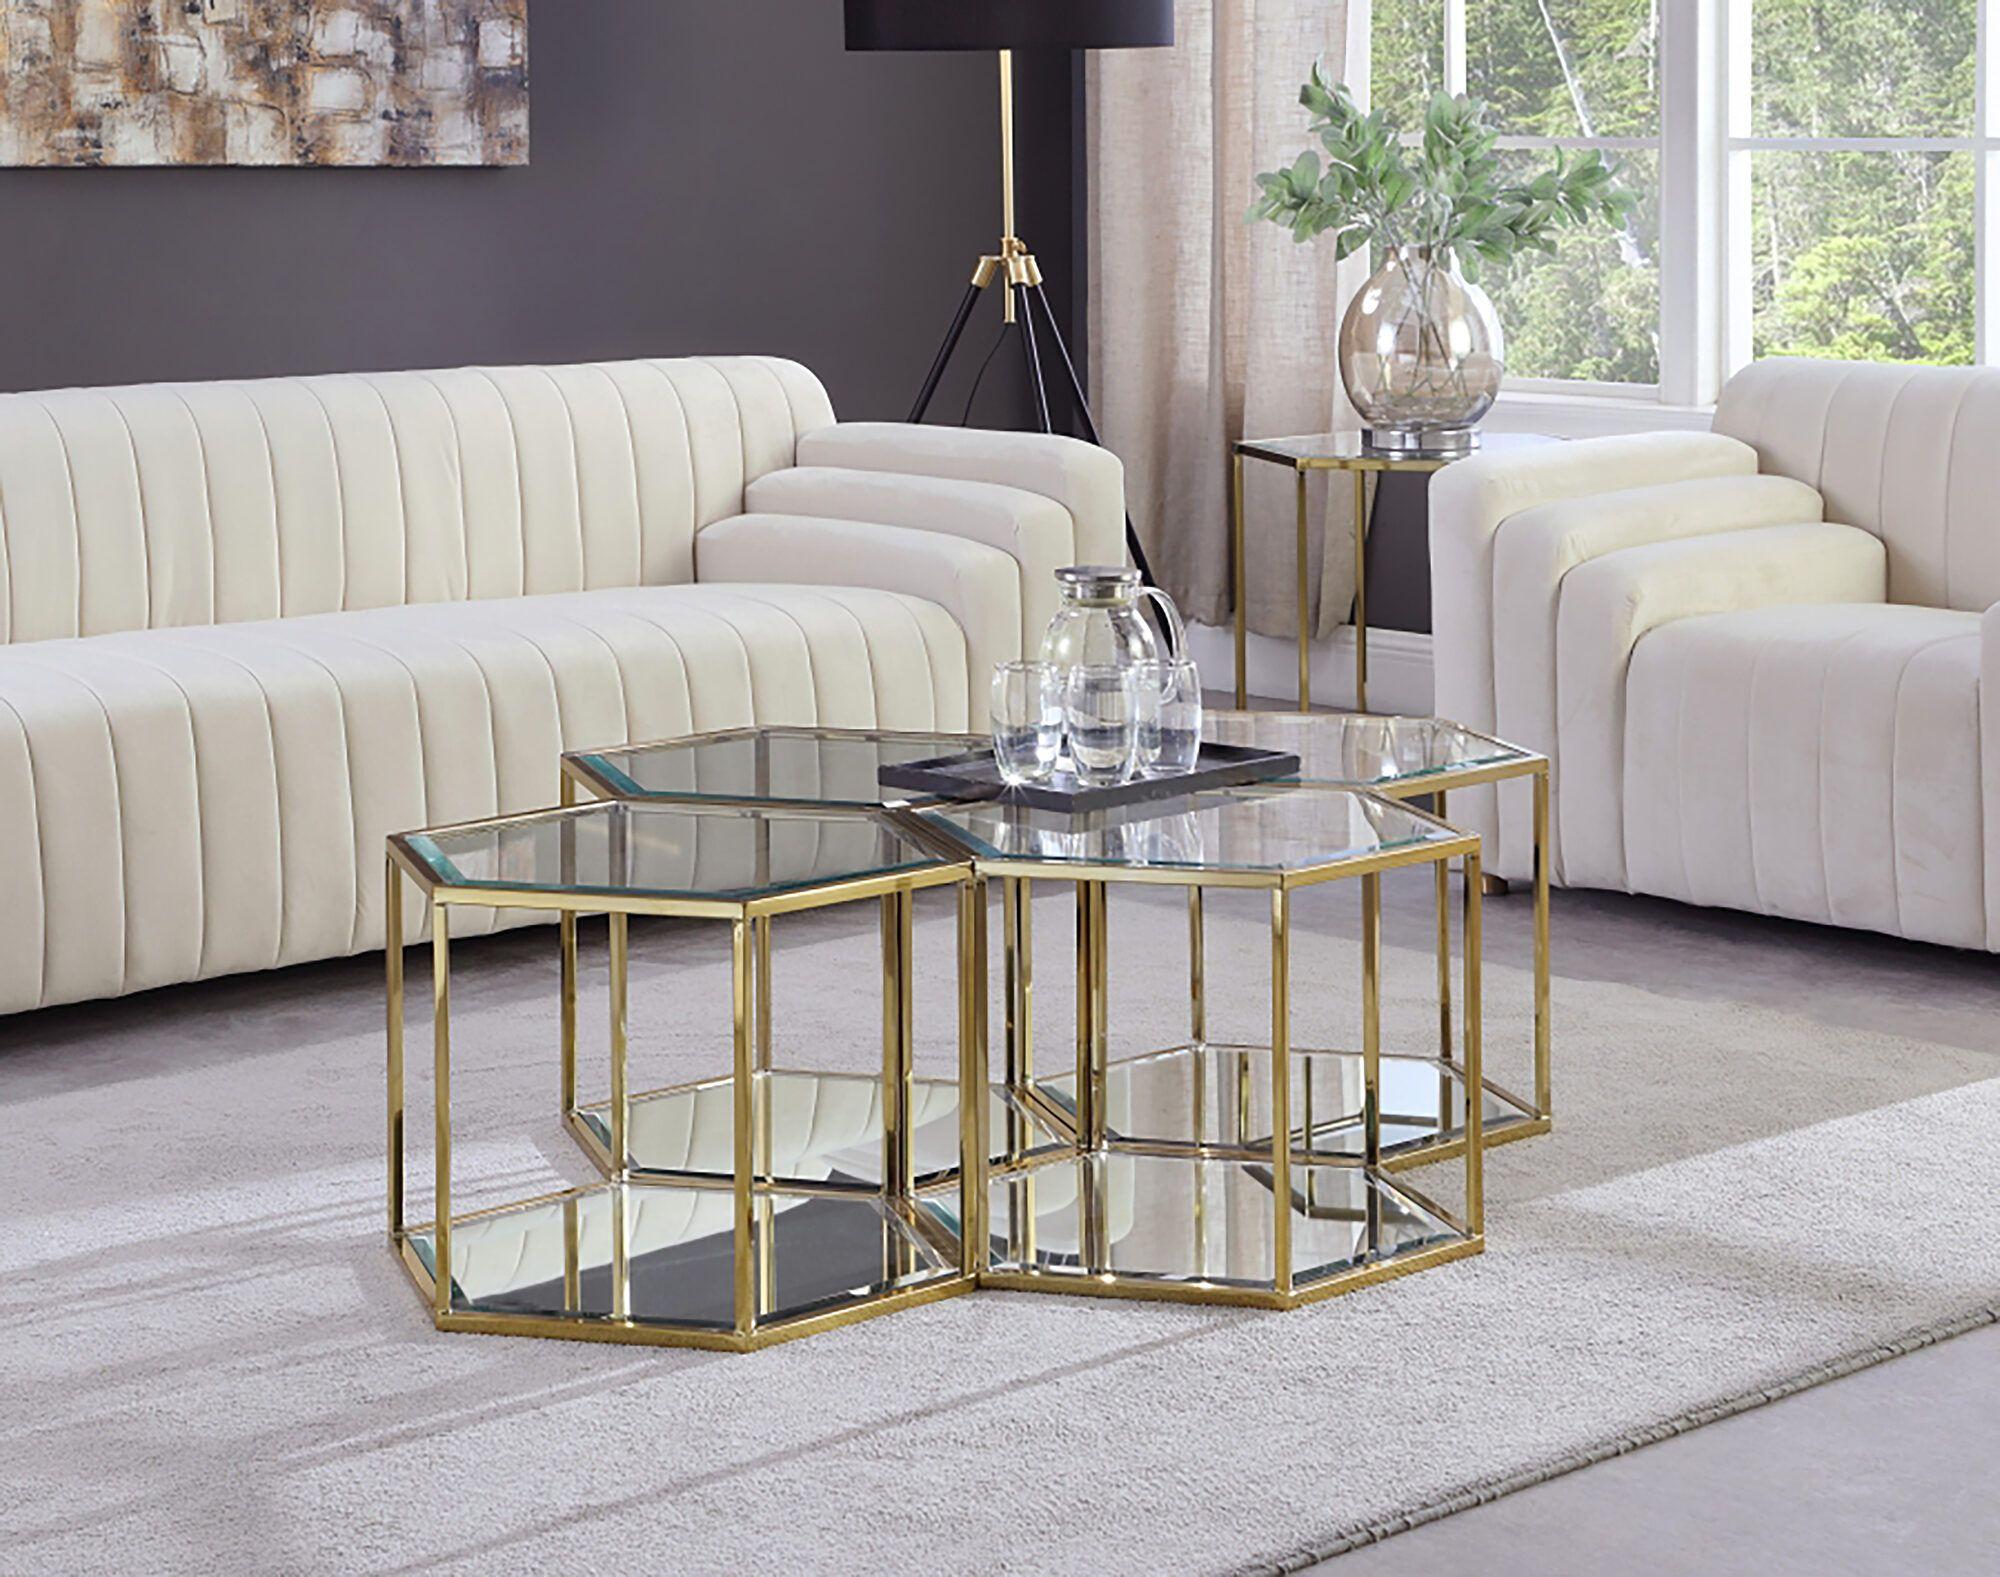 Sei 4 Gold Coffee Table 205 Ct 4pc Meridian Furniture Coffee Tables In 2021 Modular Coffee Table Coffee Table Gold Coffee Table [ 1577 x 2000 Pixel ]